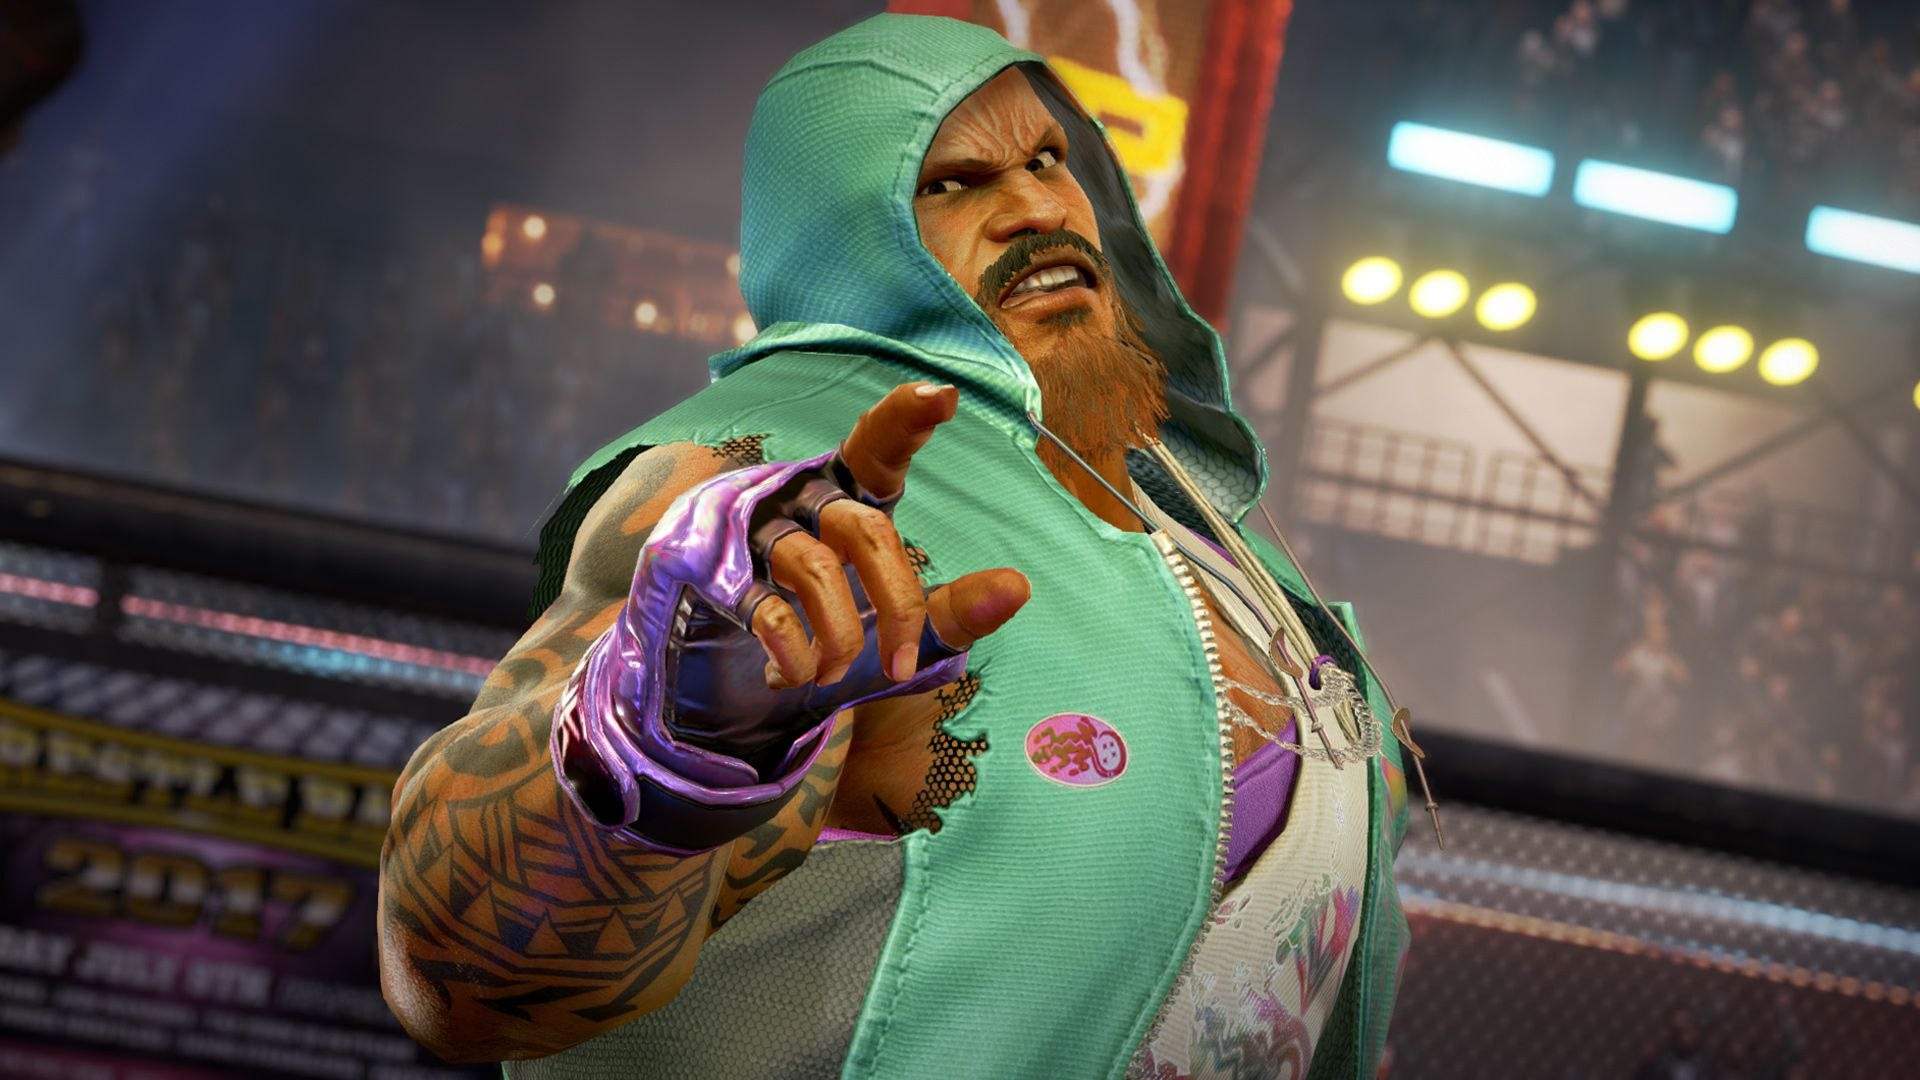 Marduk Armor King And Julia Join The Tekken 7 Roster Bandai